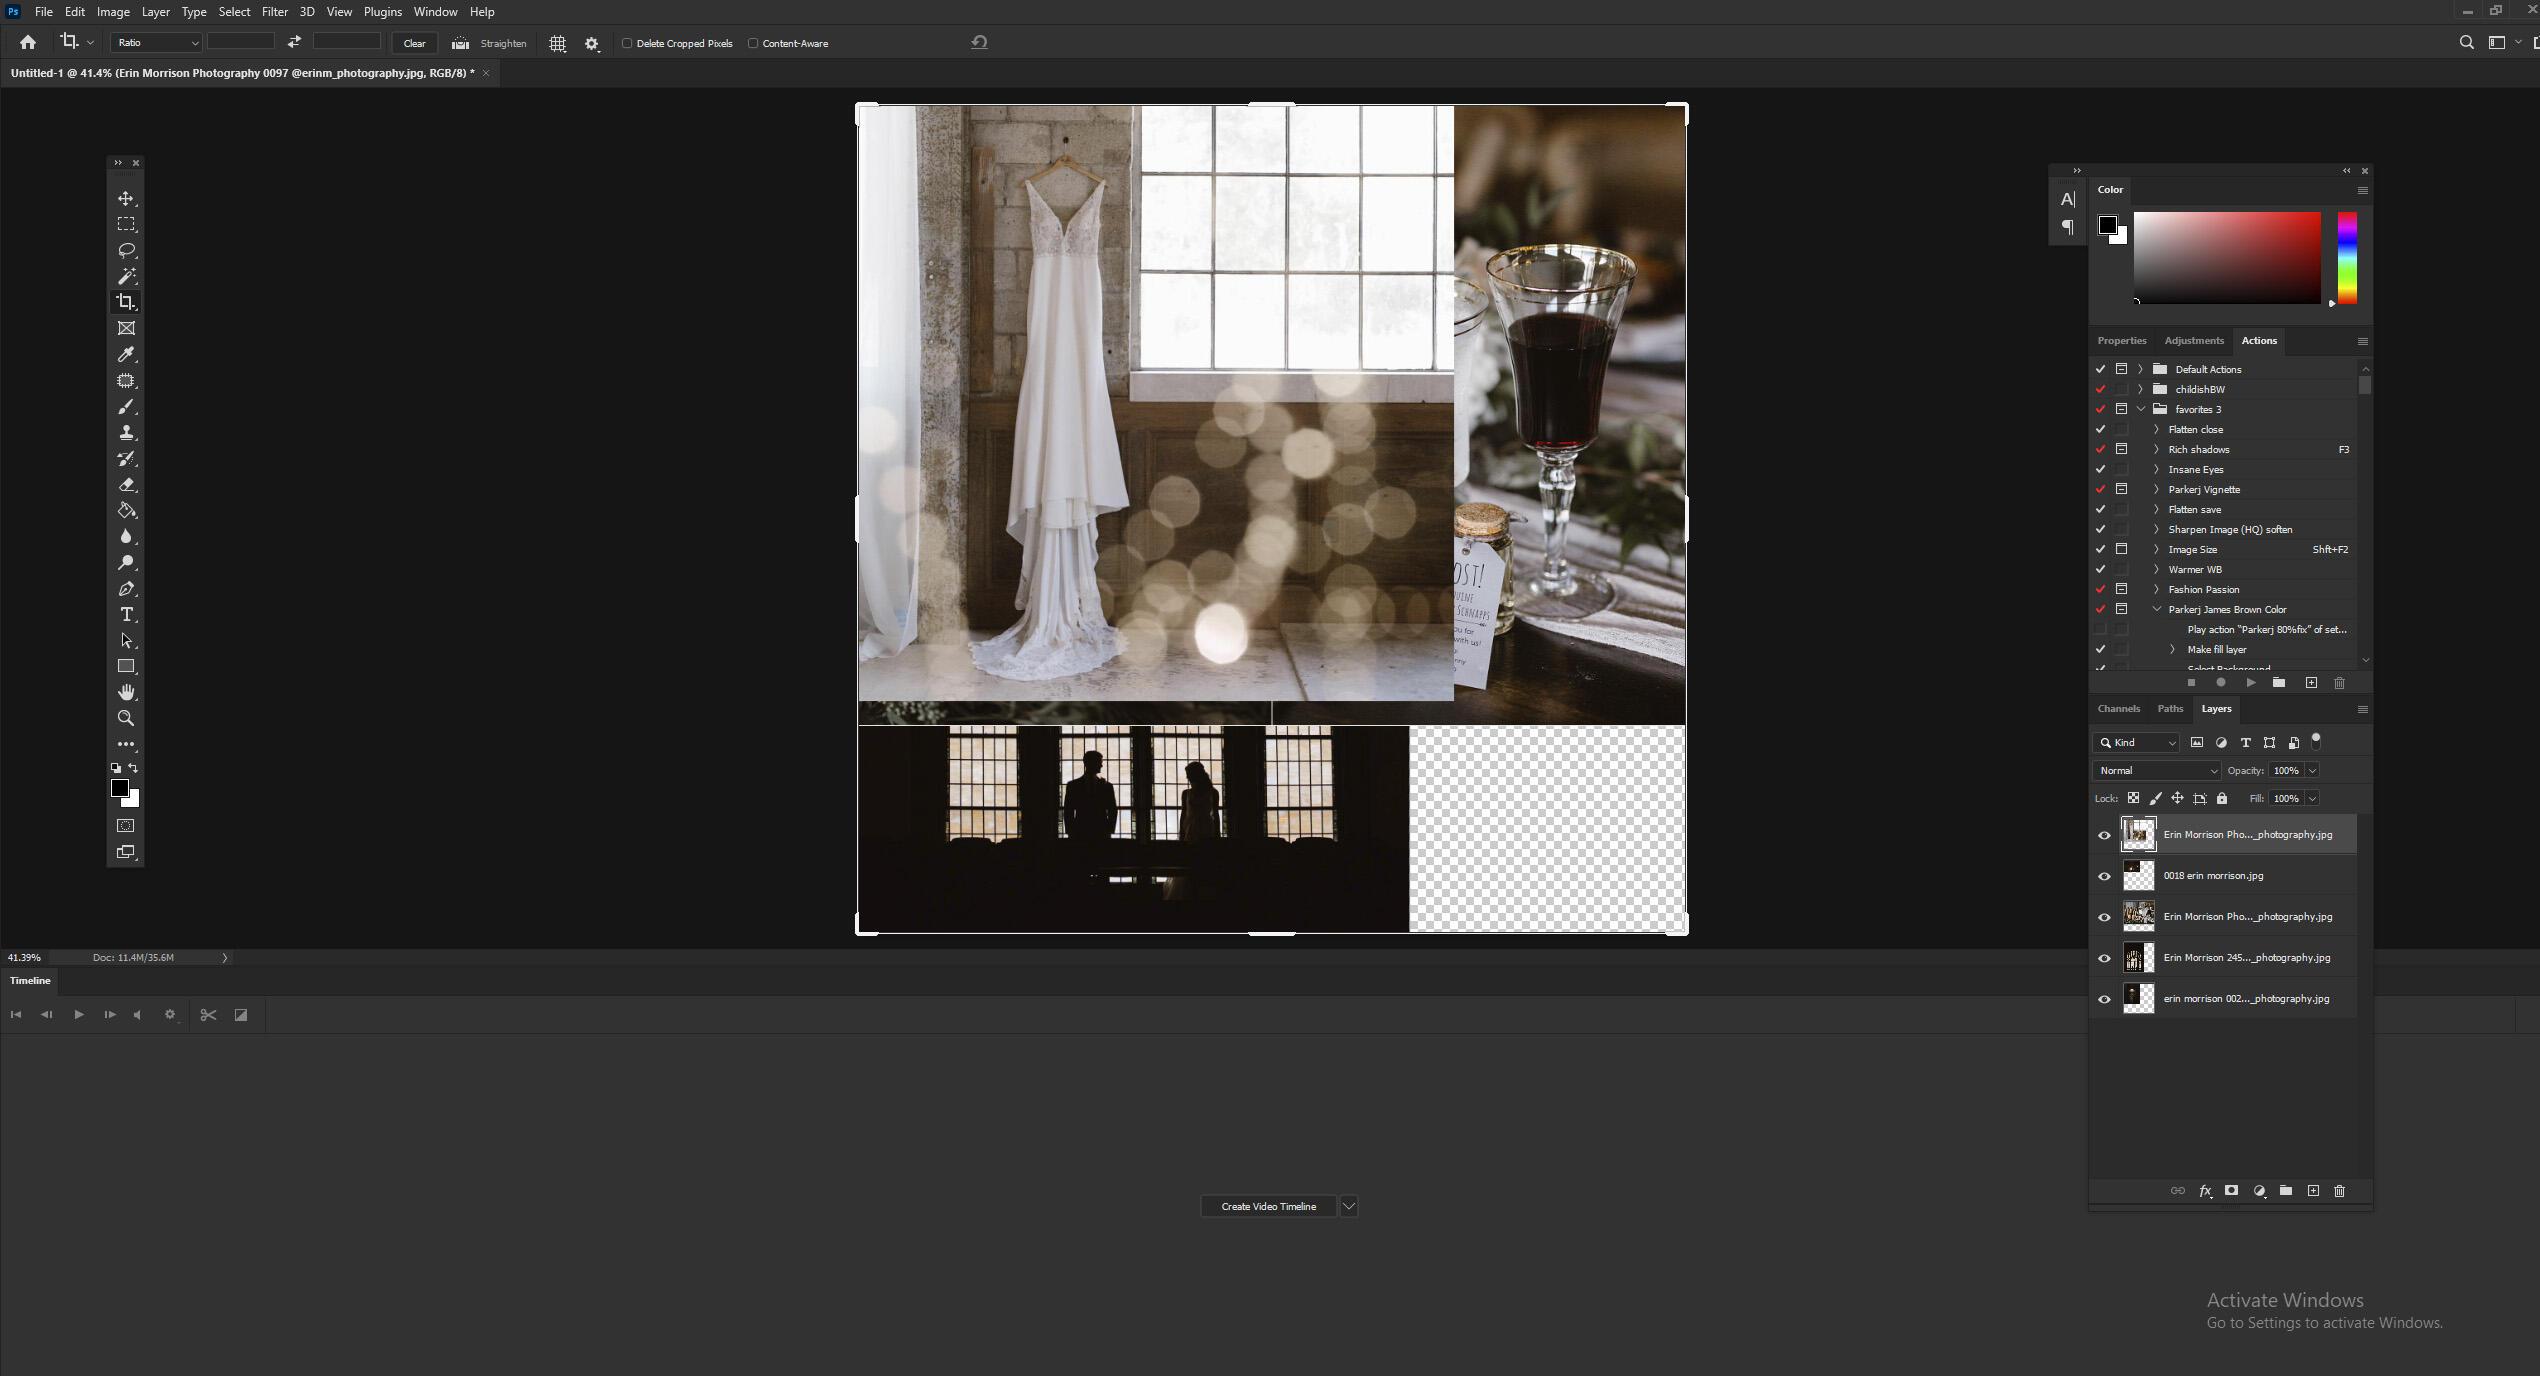 Creating GIFs